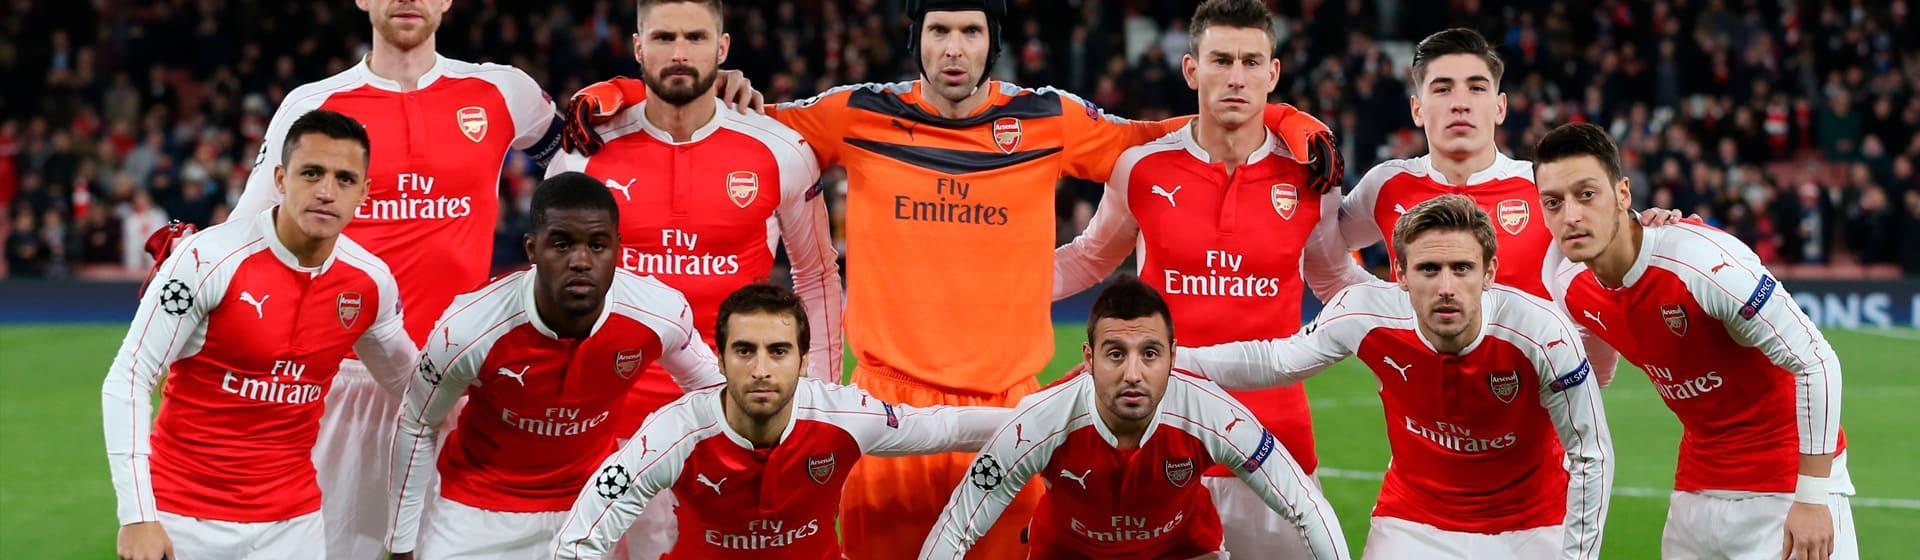 FC Arsenal - Мерч и одежда с атрибутикой